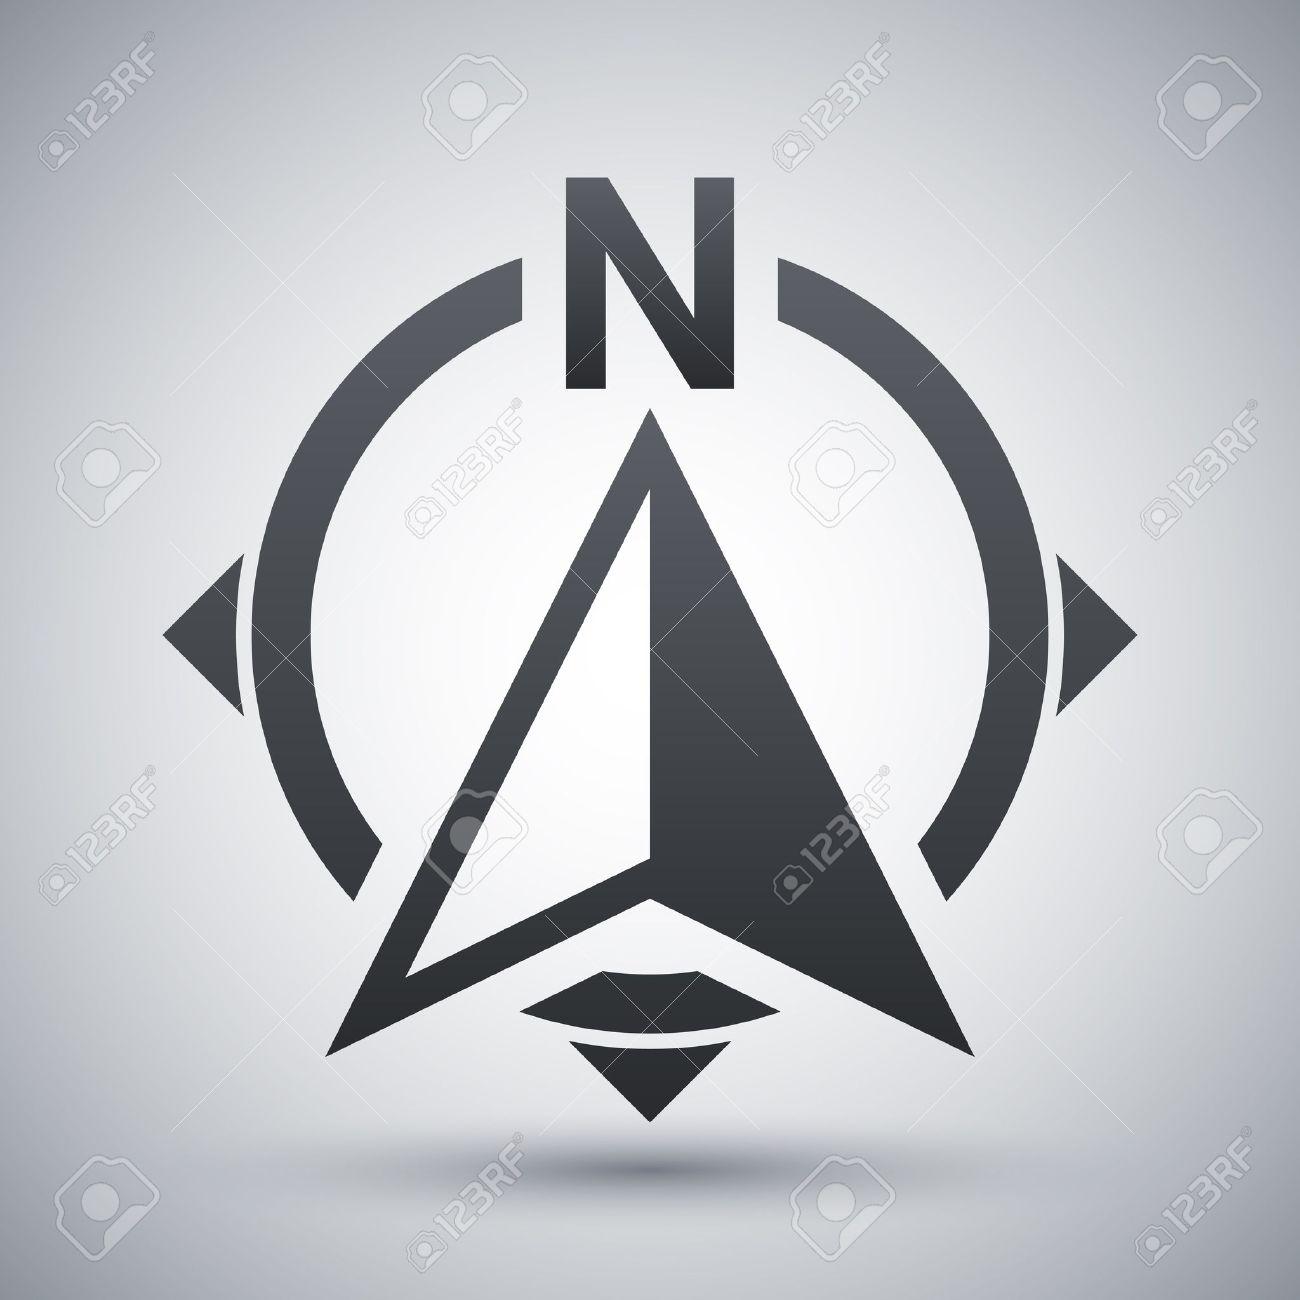 North direction compass icon - 50904129